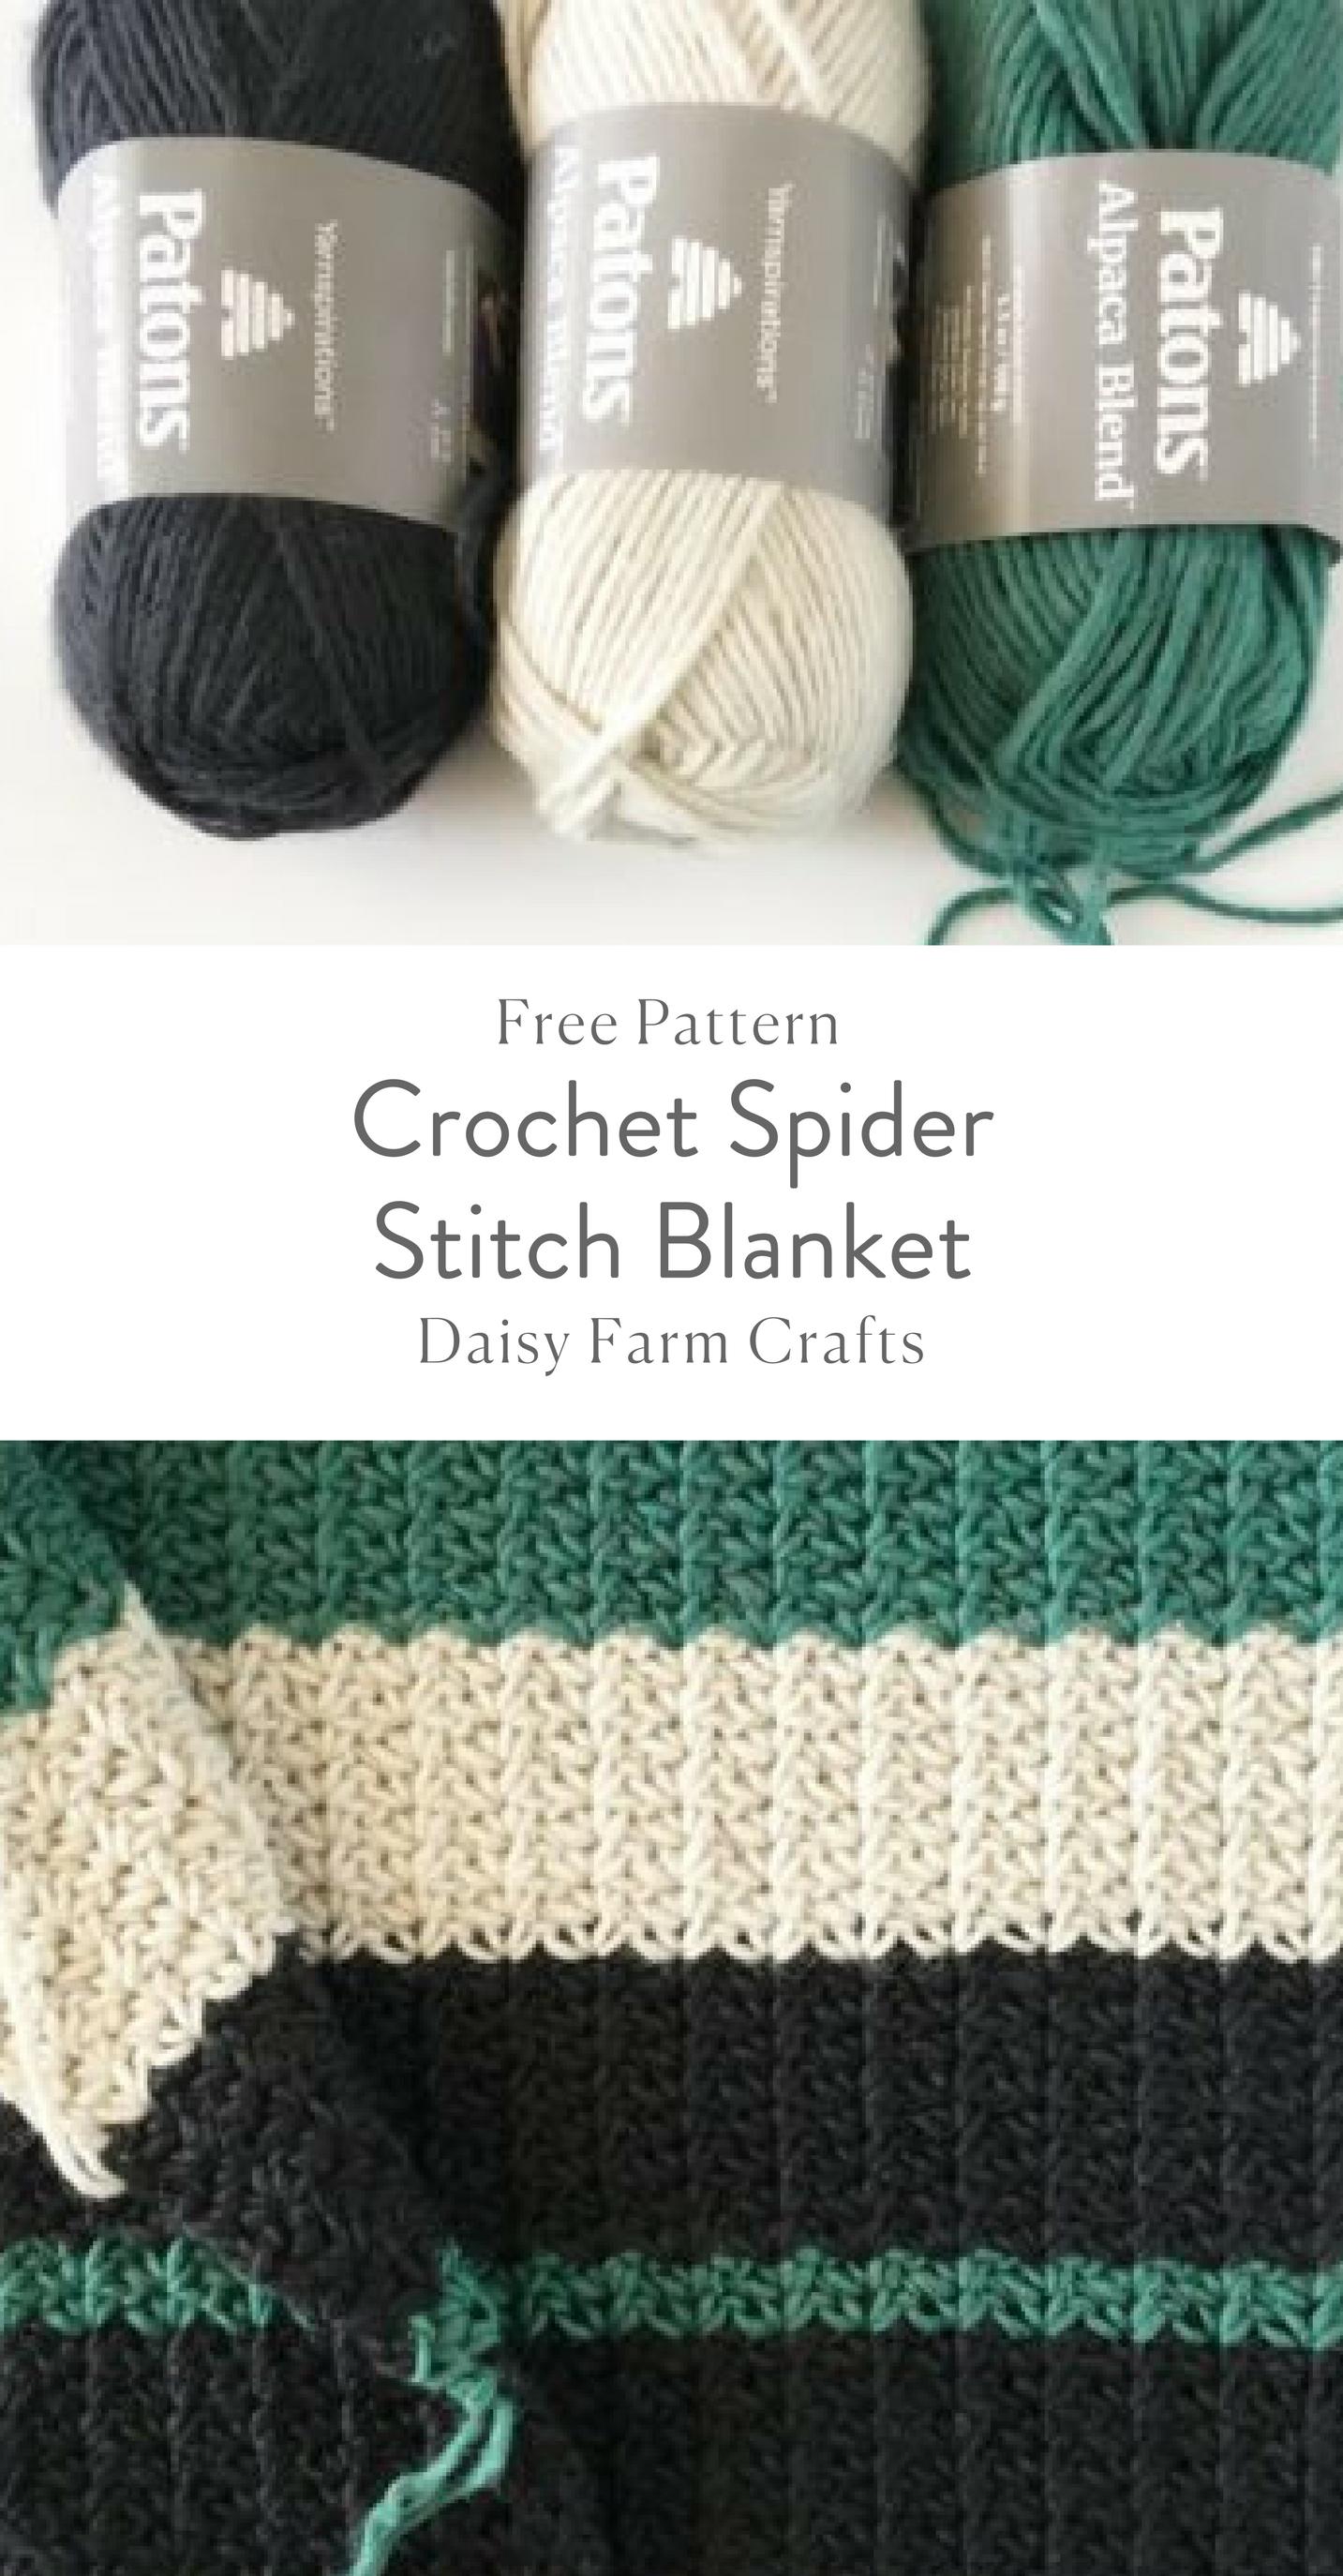 Free Pattern - Crochet Spider Stitch Blanket | Lavoretti | Pinterest ...